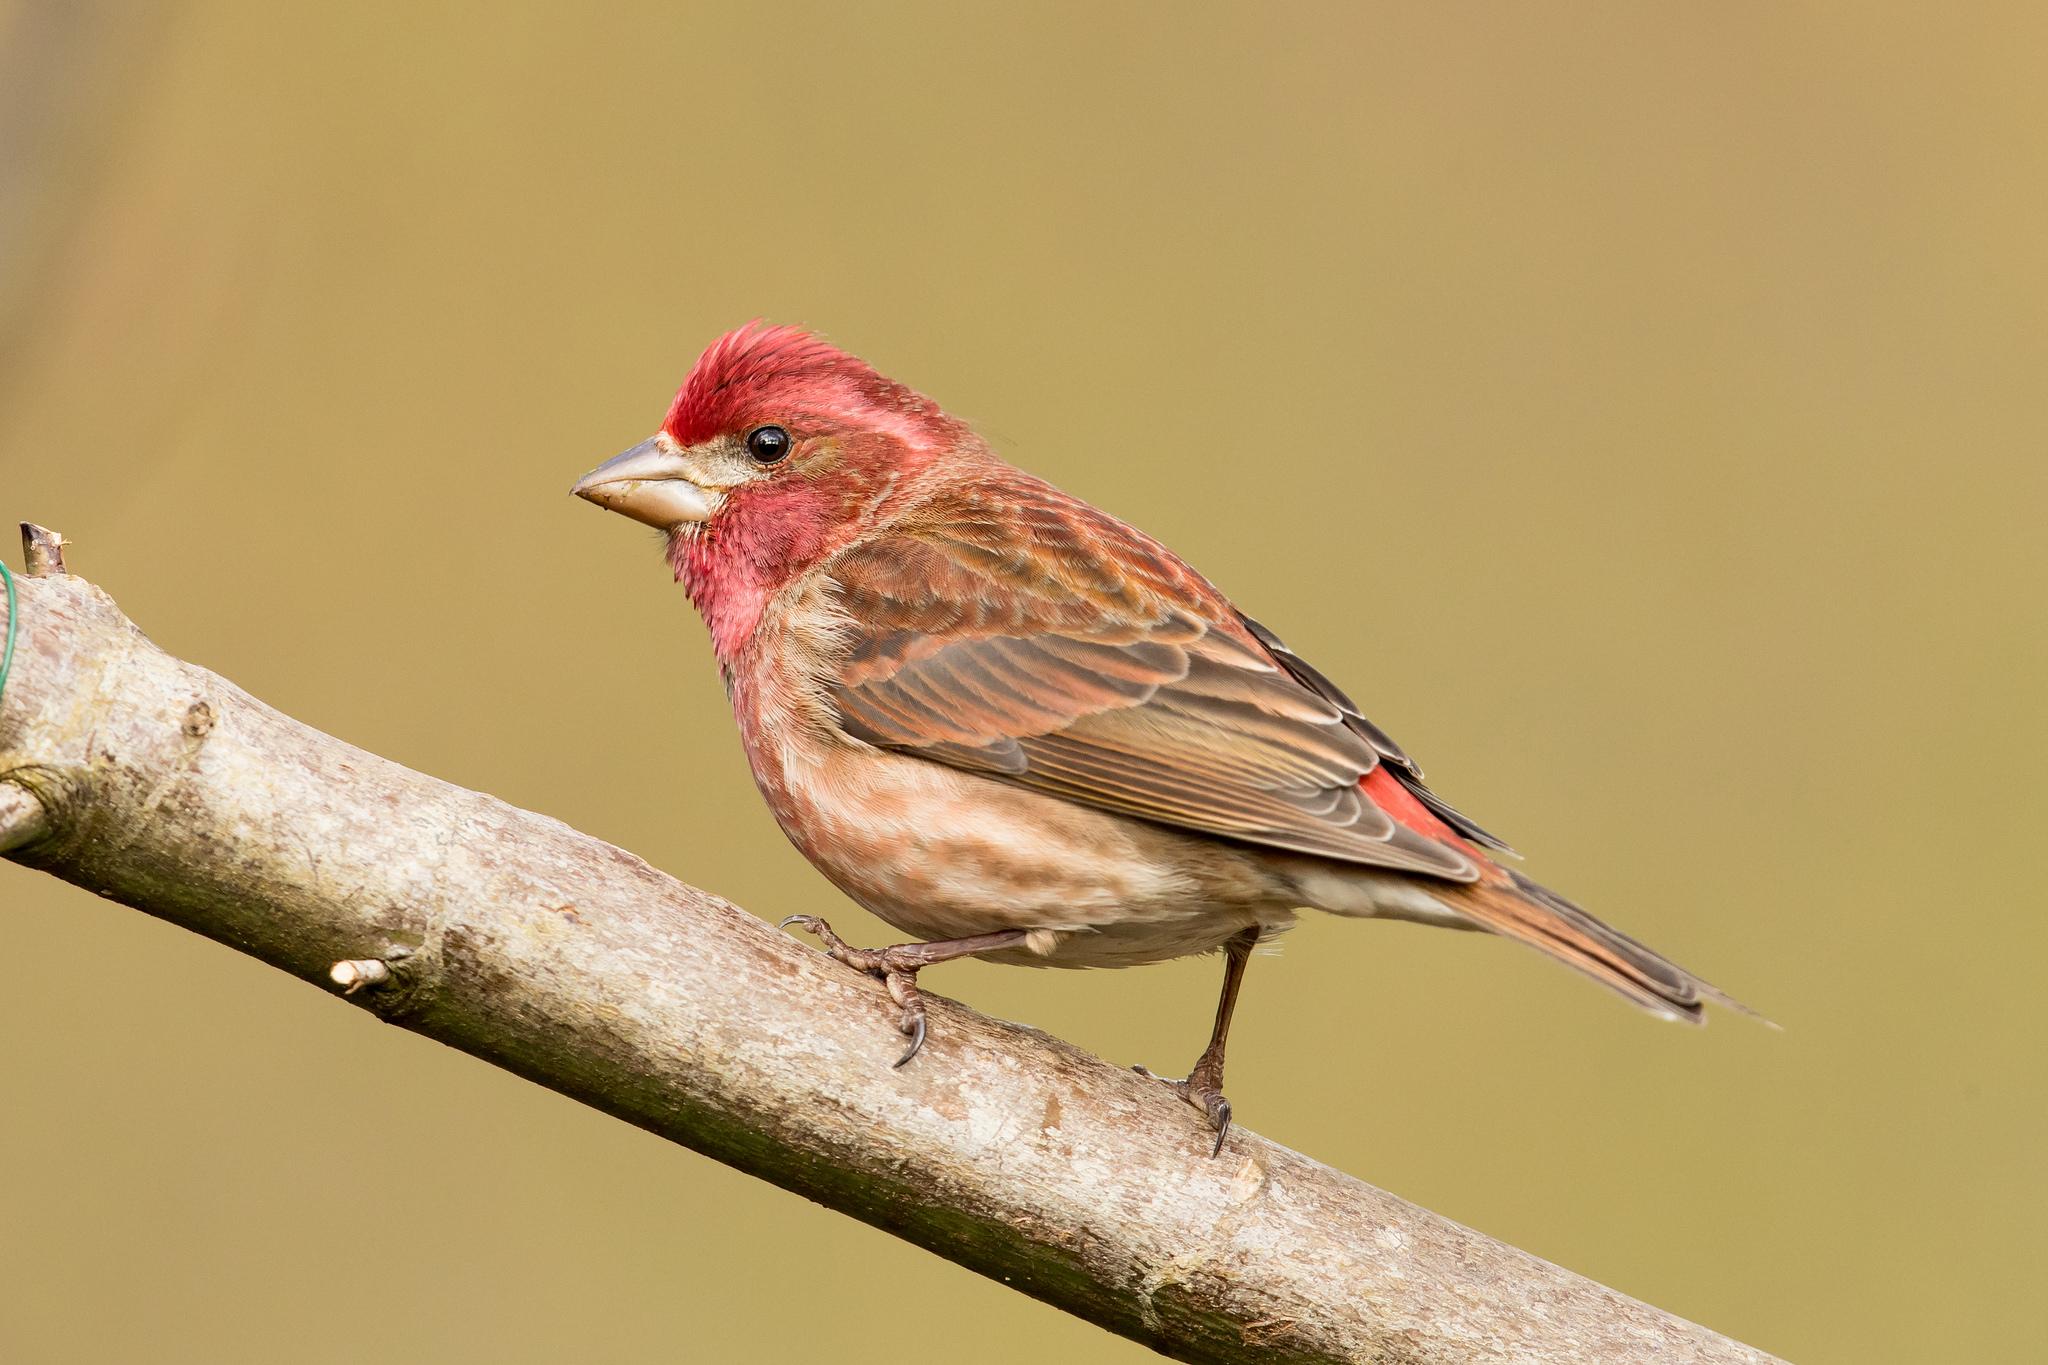 Photo: Purple Finch, by Mick Thompson